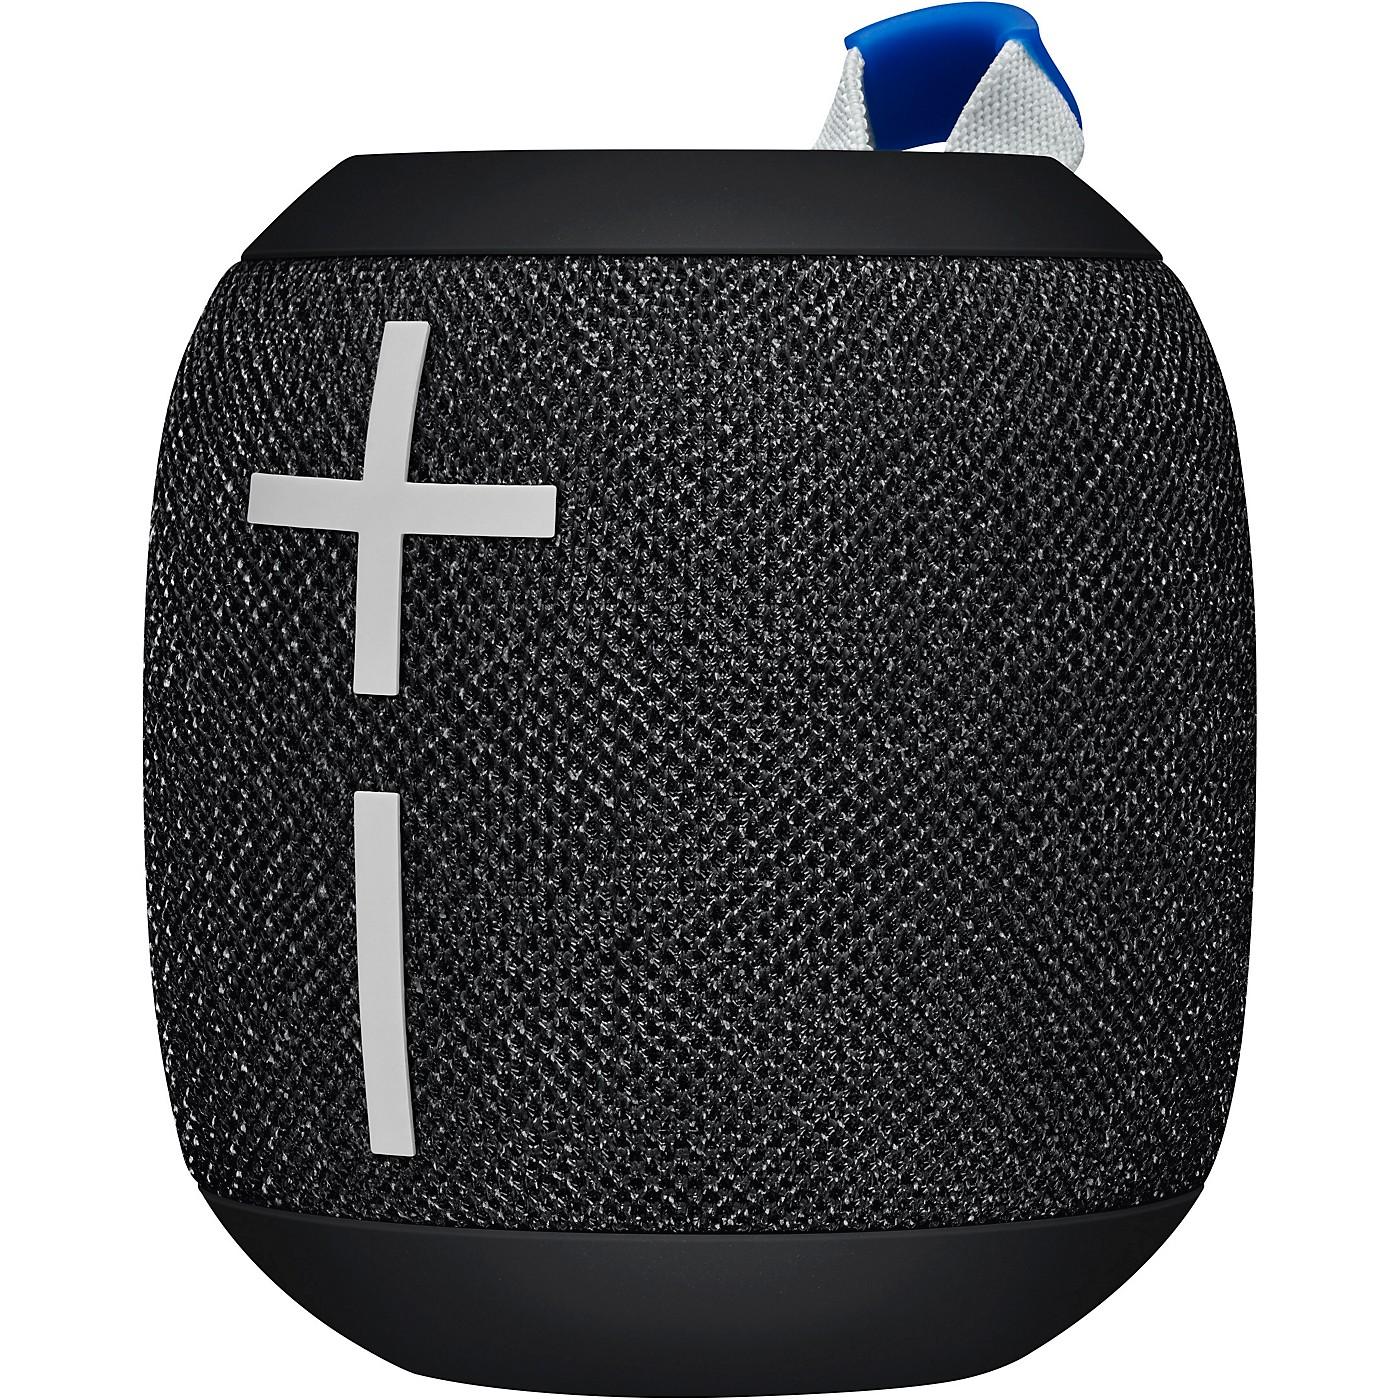 Ultimate Ears Wonderboom 2 Portable Wireless Speaker thumbnail